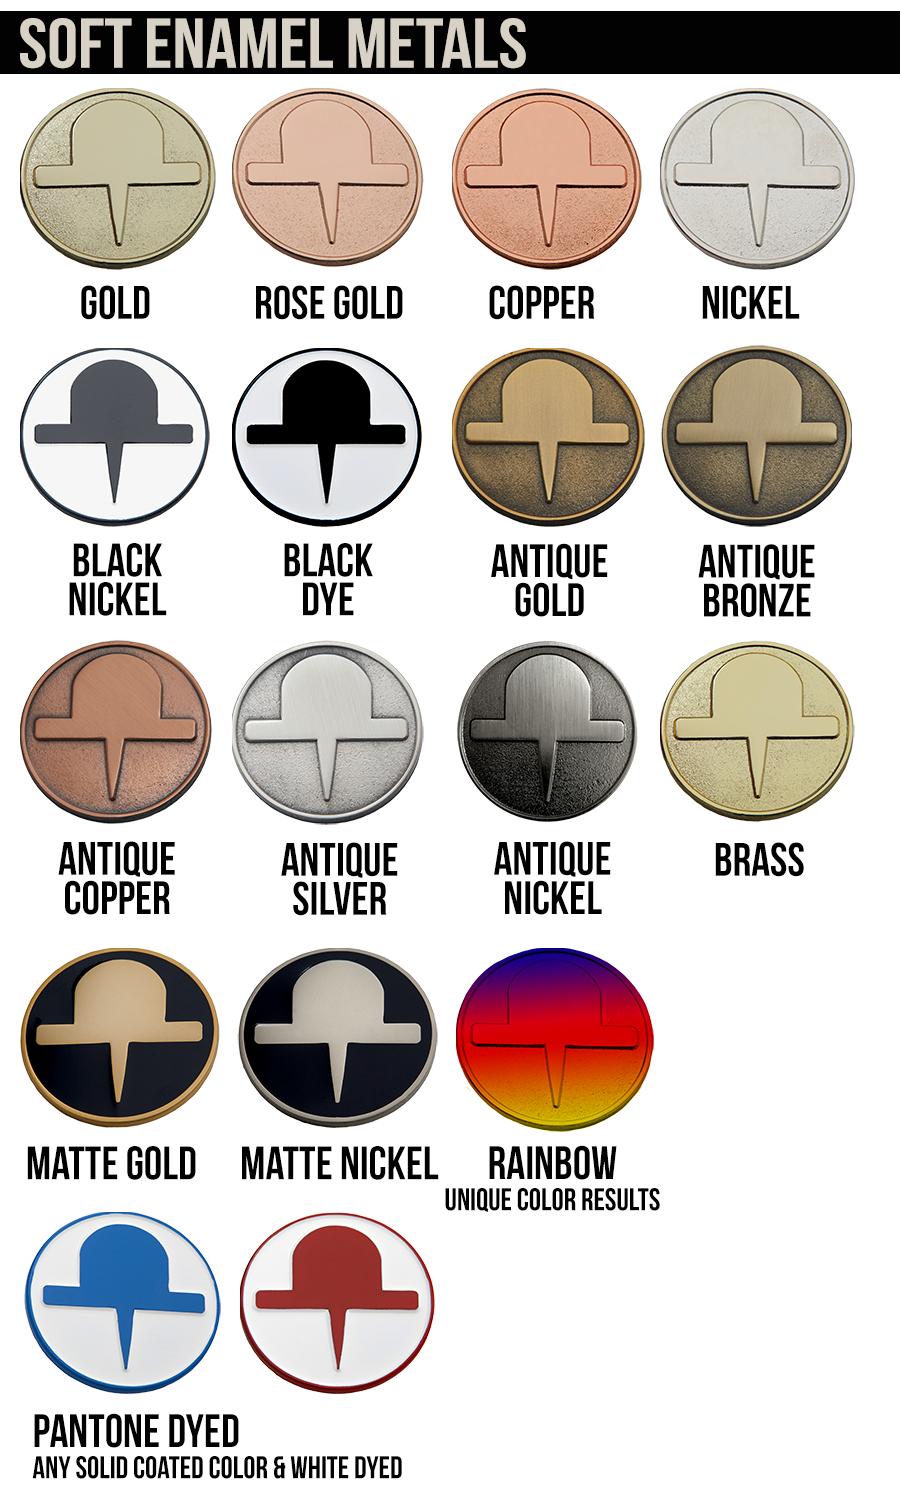 softenamel.metals.revised.png